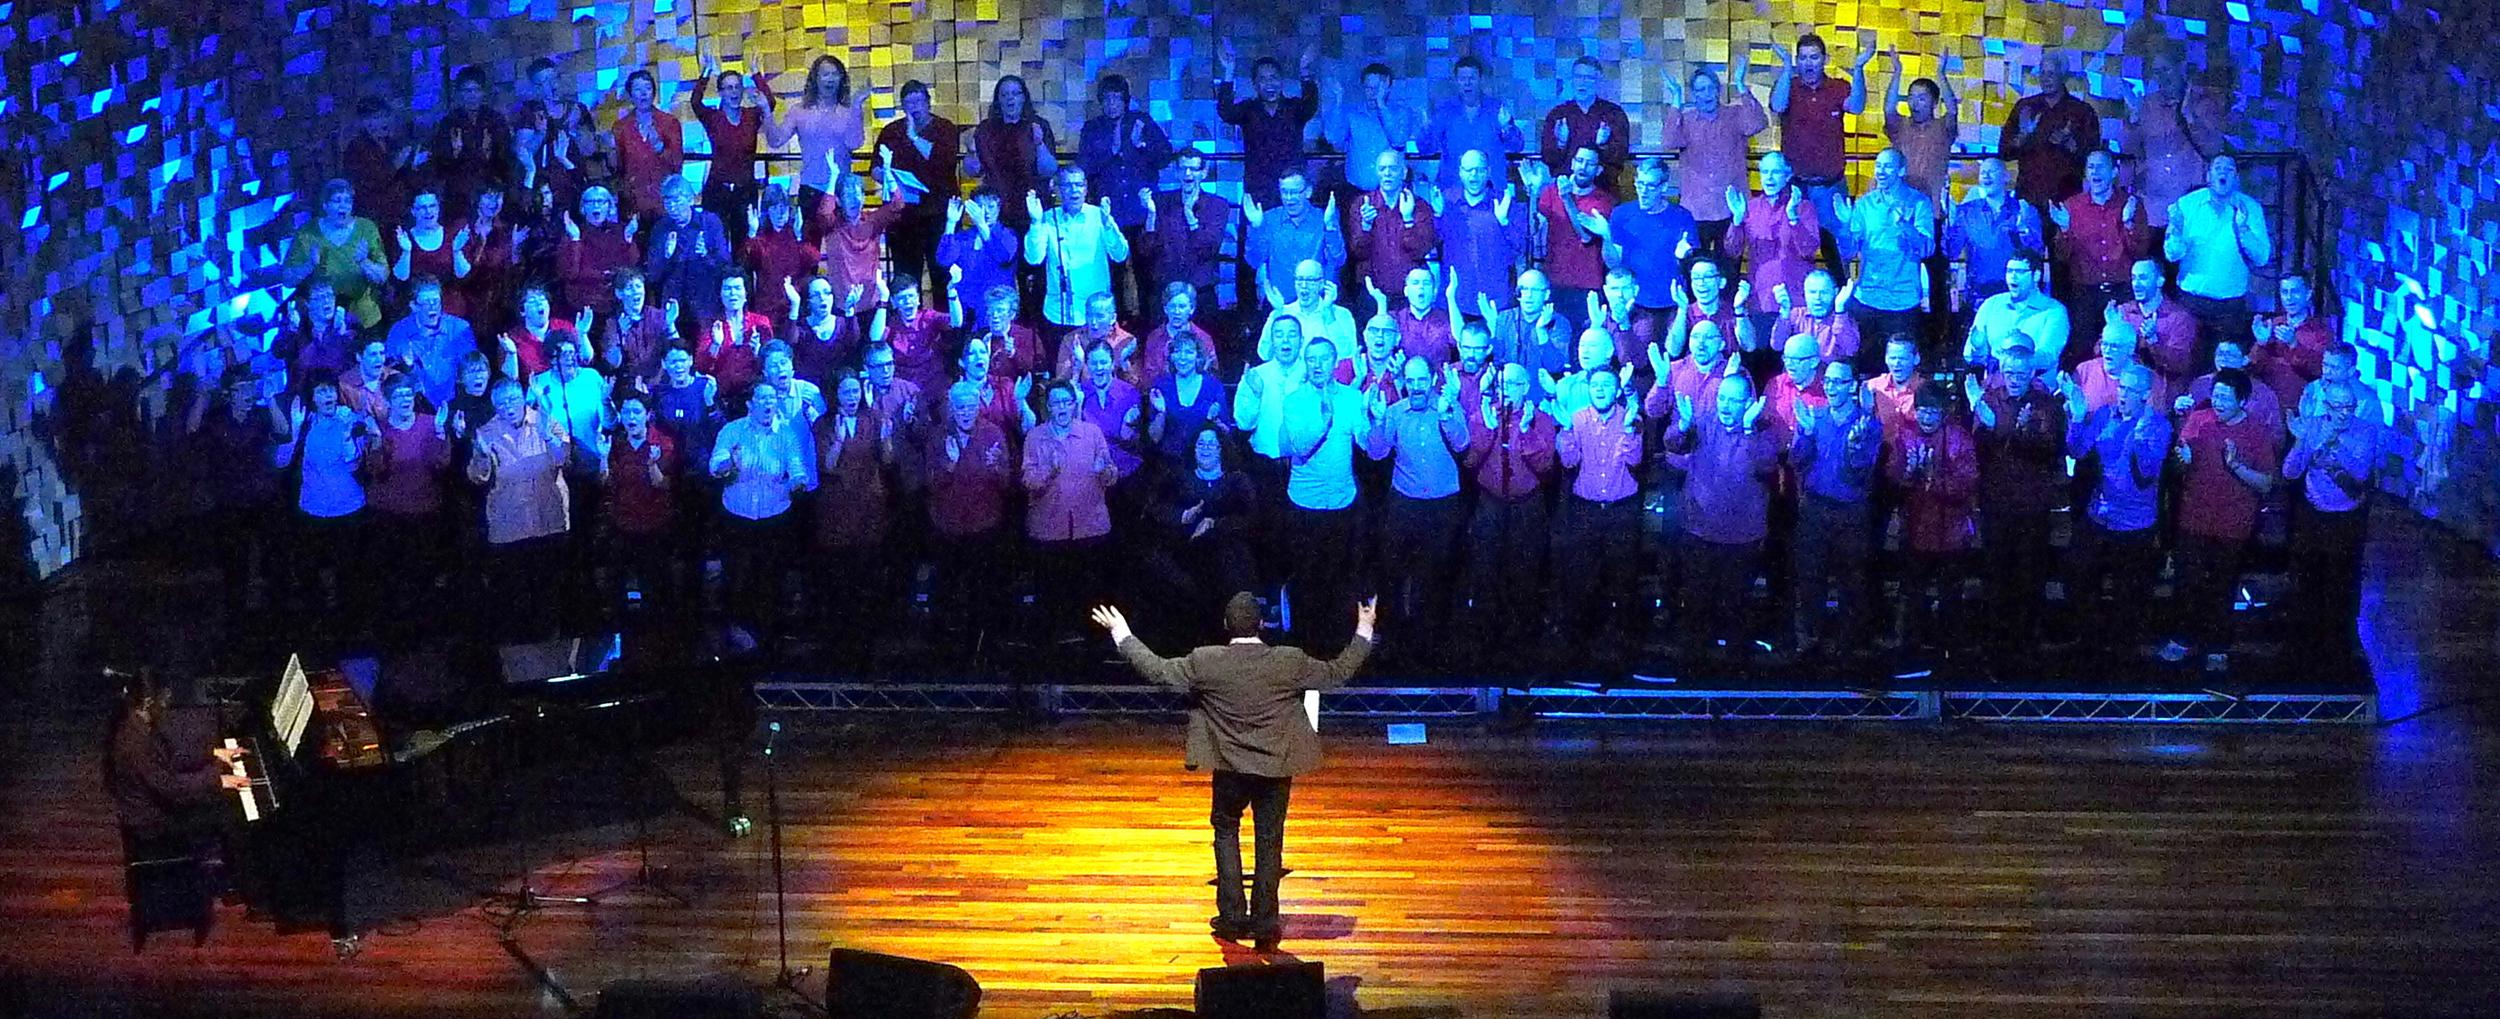 Hobart Fed concert hall blue pic.jpg